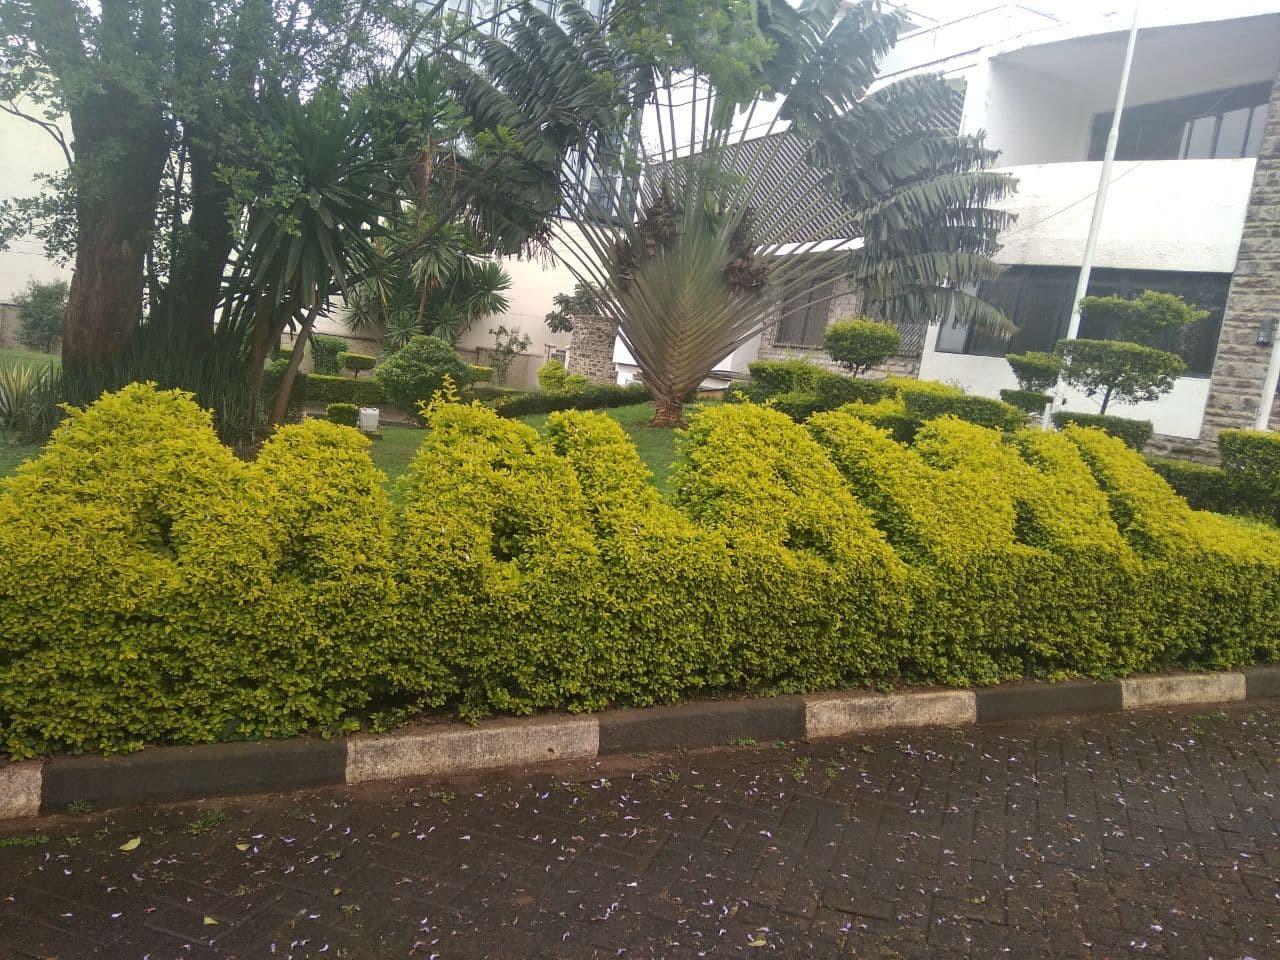 Malawi Embassy, Nairobi, Kenya